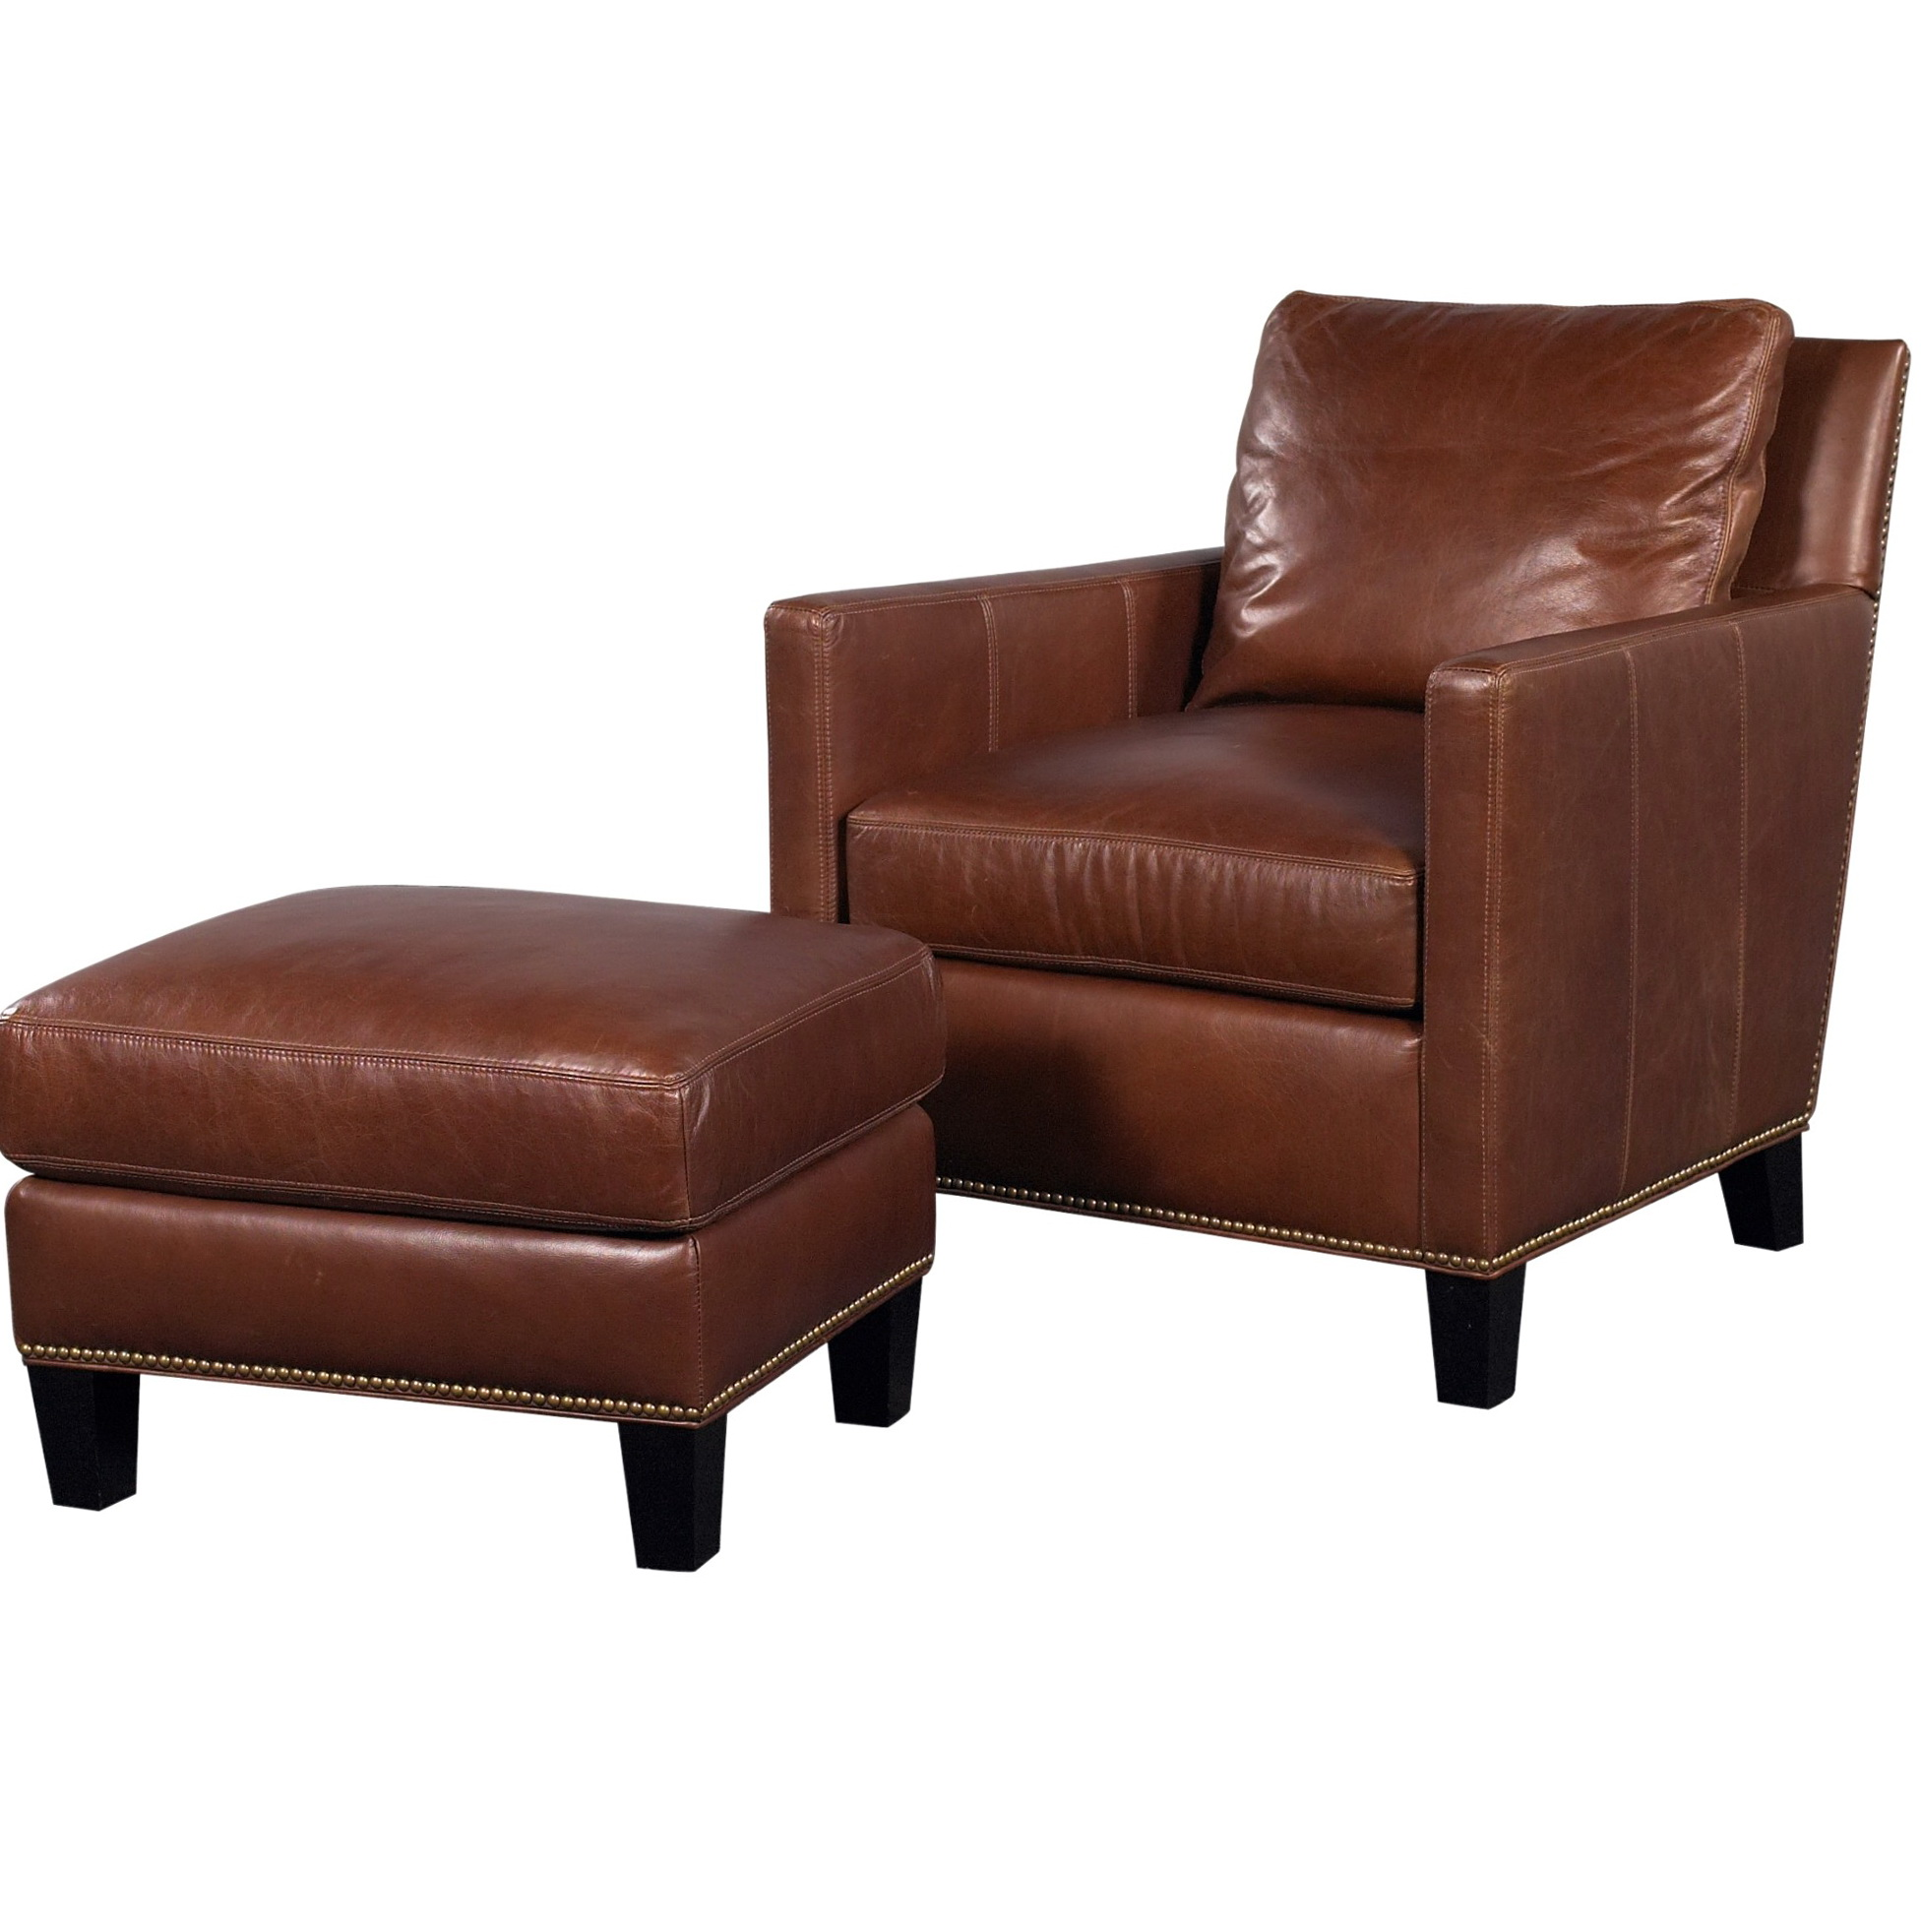 Ikea chair ottoman ikea ektorp bromma cover footstool for Ikea chair with ottoman